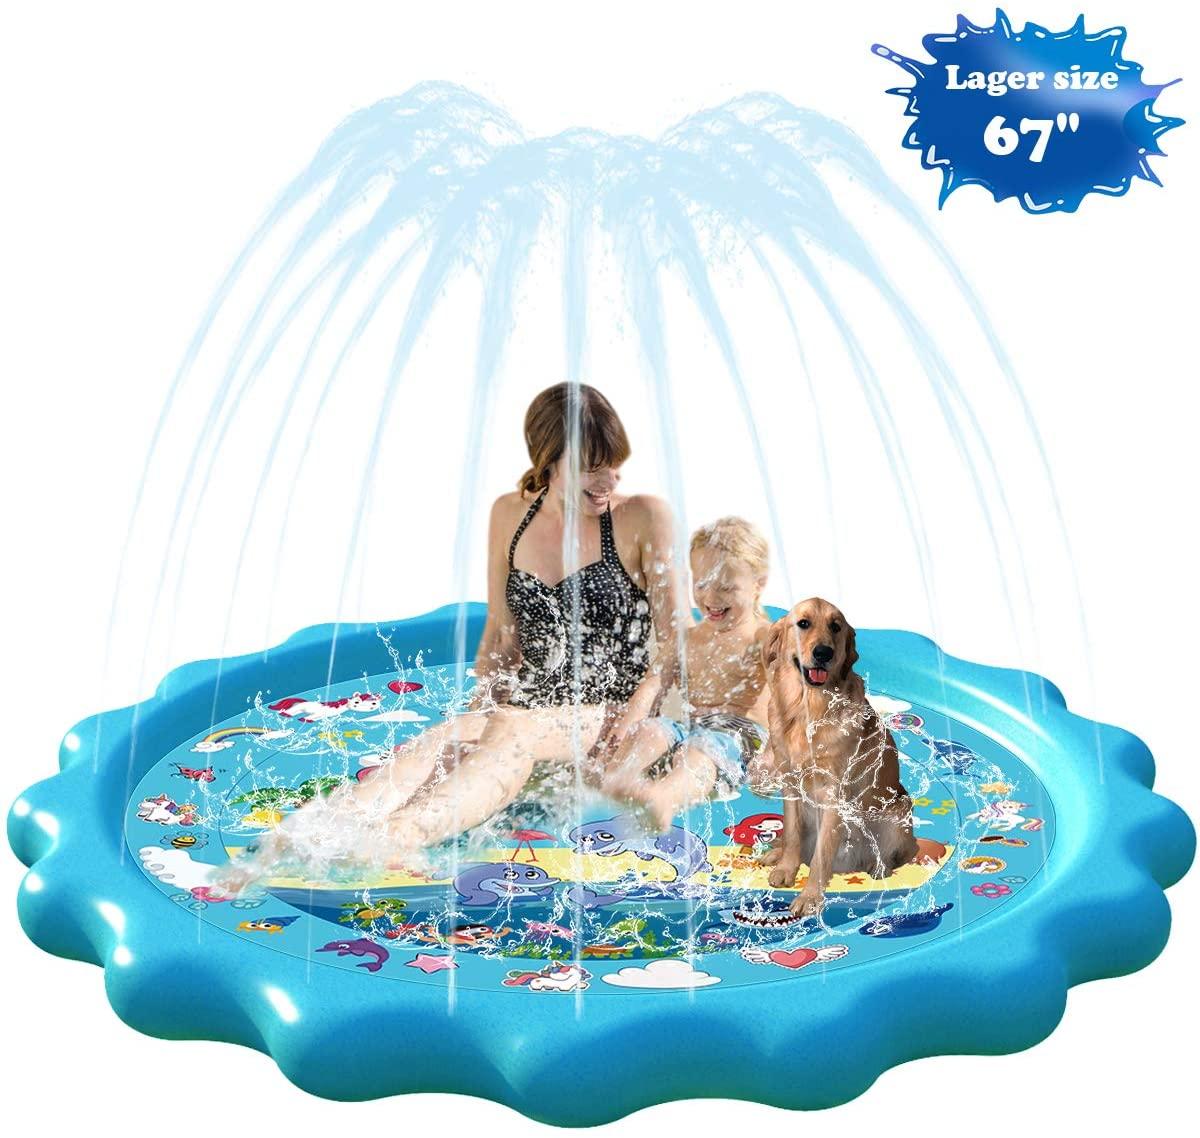 Homydom Sprinkler for Kids, Splash Pad for Toddlers Outdoor Inflatable Sprinkler Water Toys for Kids Unicorn